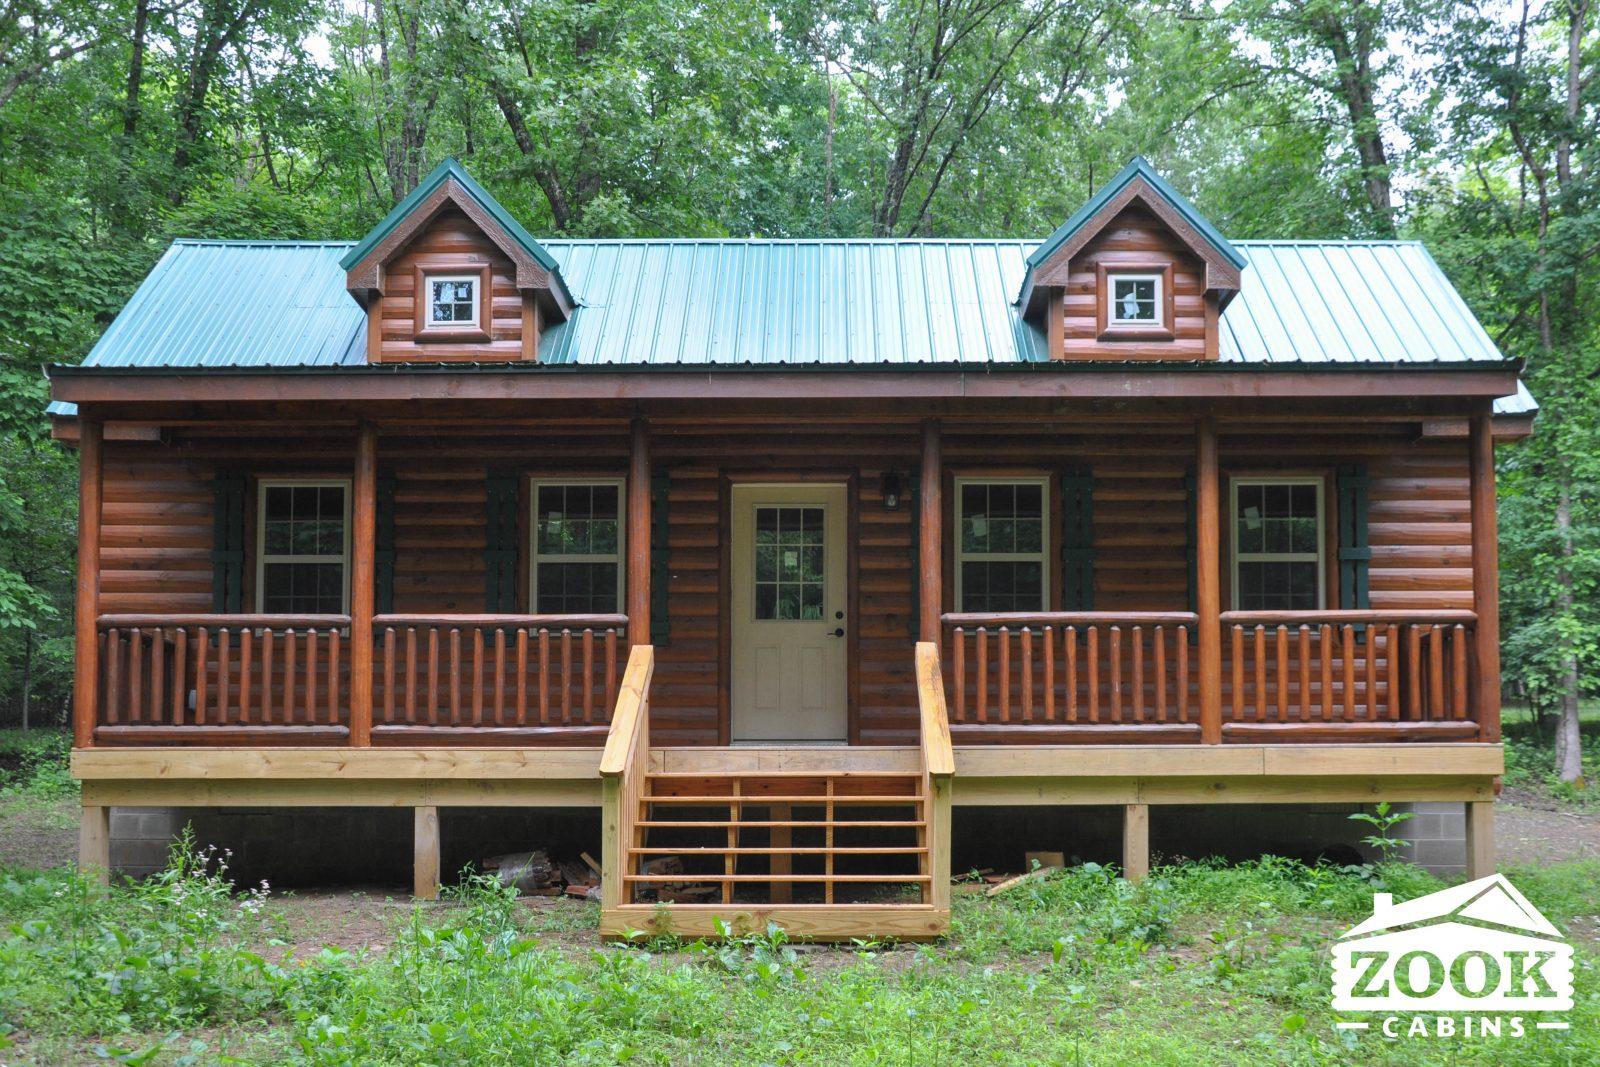 The Plymouth Prefab Log Cabin in North Carolina